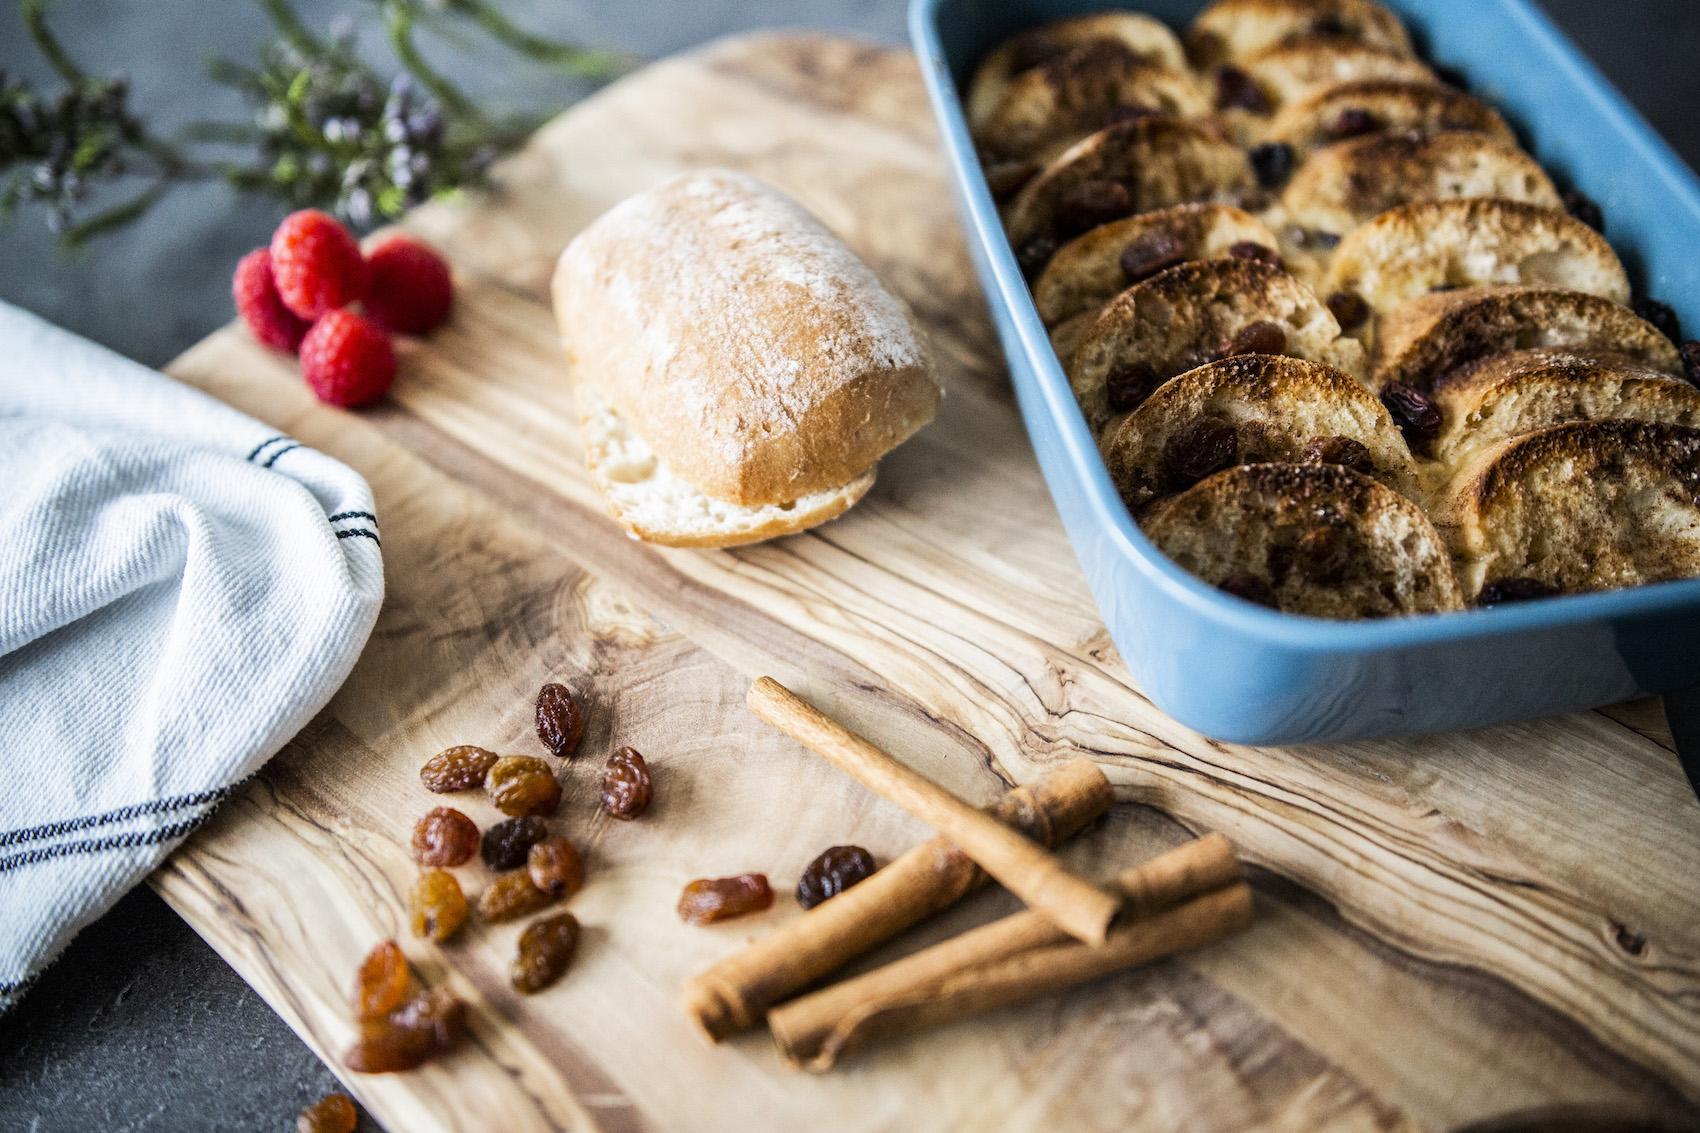 suelovesnyc_ciabatta_rezept_dessert_glutenfrei_schaer_ciabatta_franzbroetchen_schaer_ciabatta_broetchen_makingof